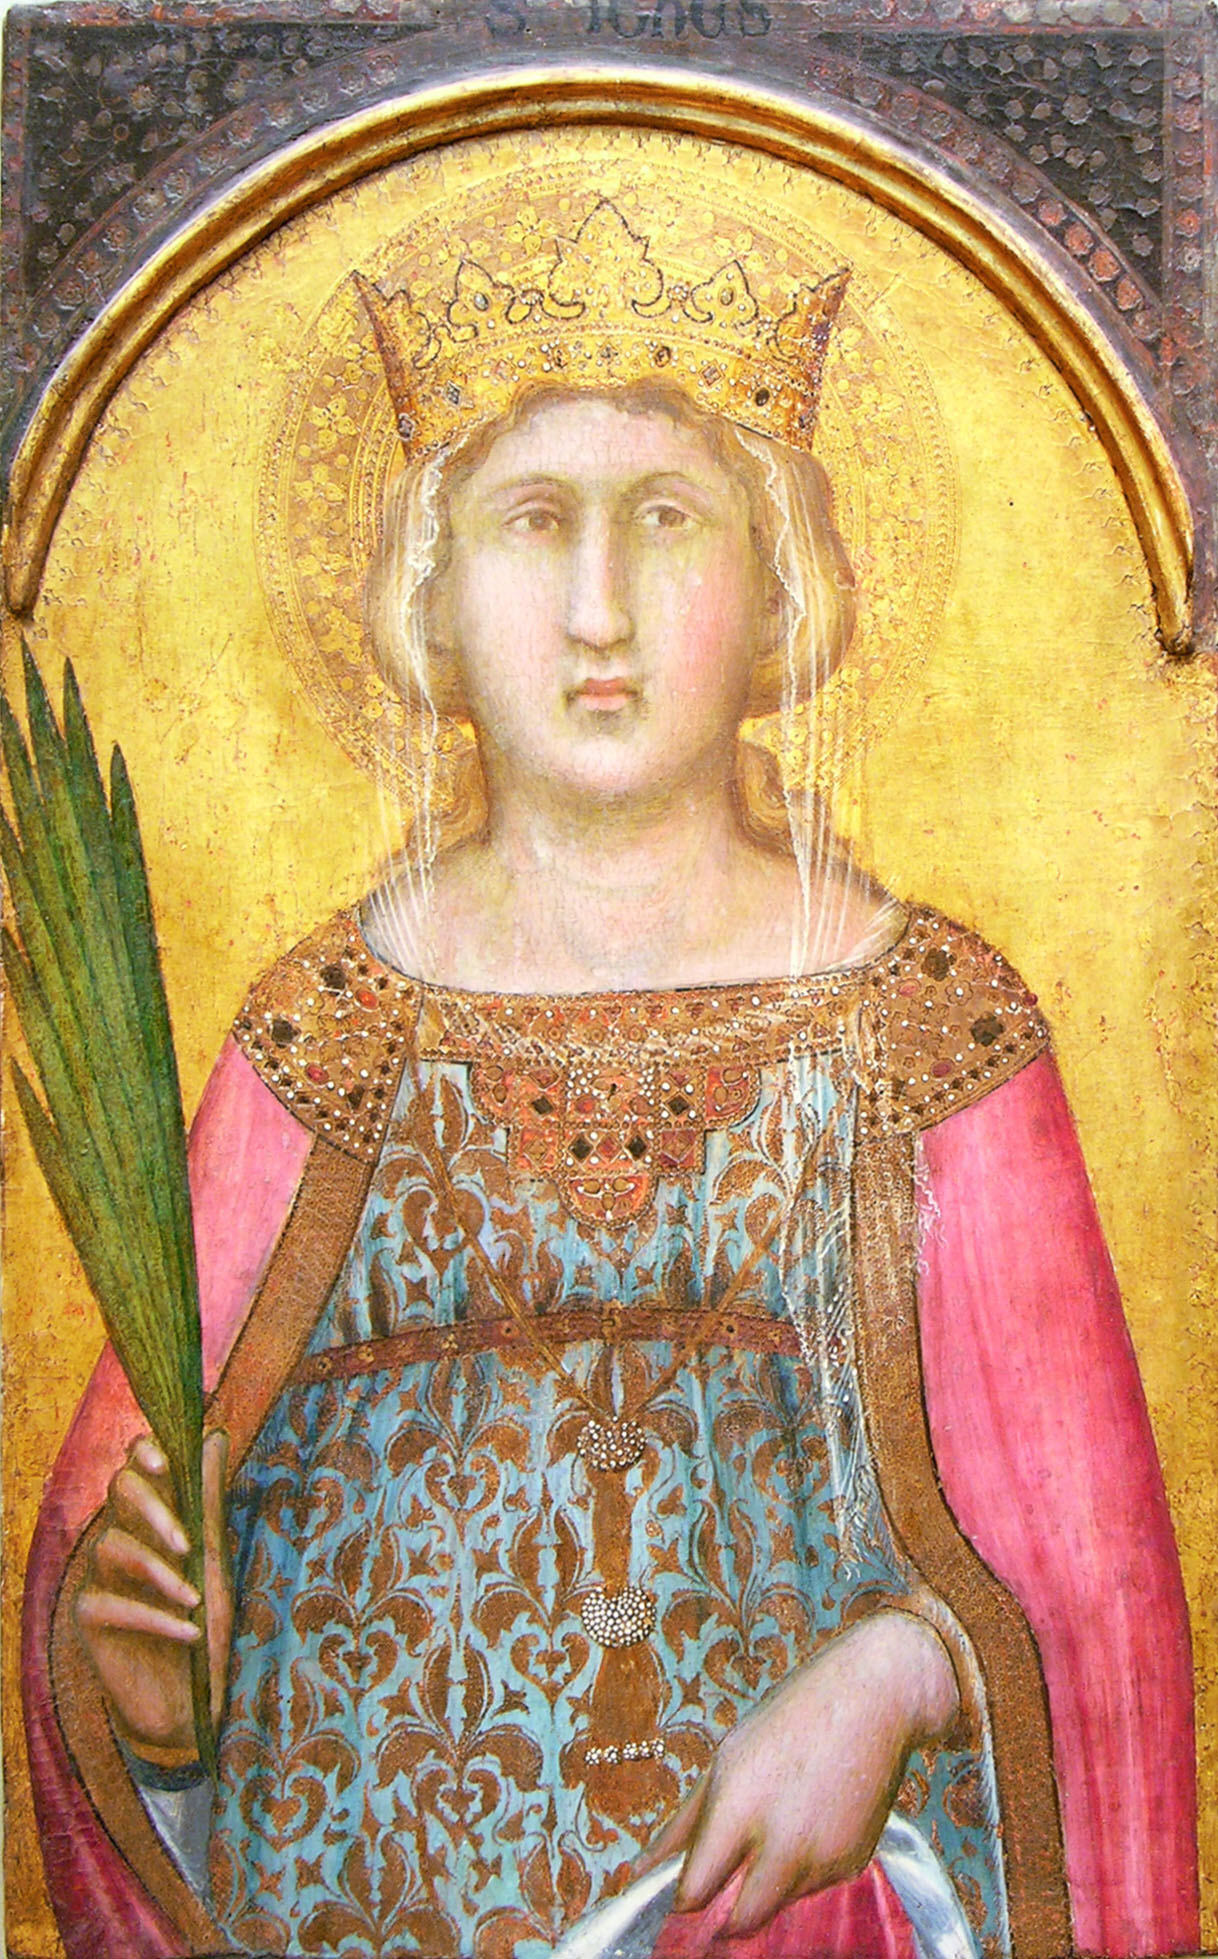 Saint Catherine of Alexandria by Pietro Lorenzetti 1342